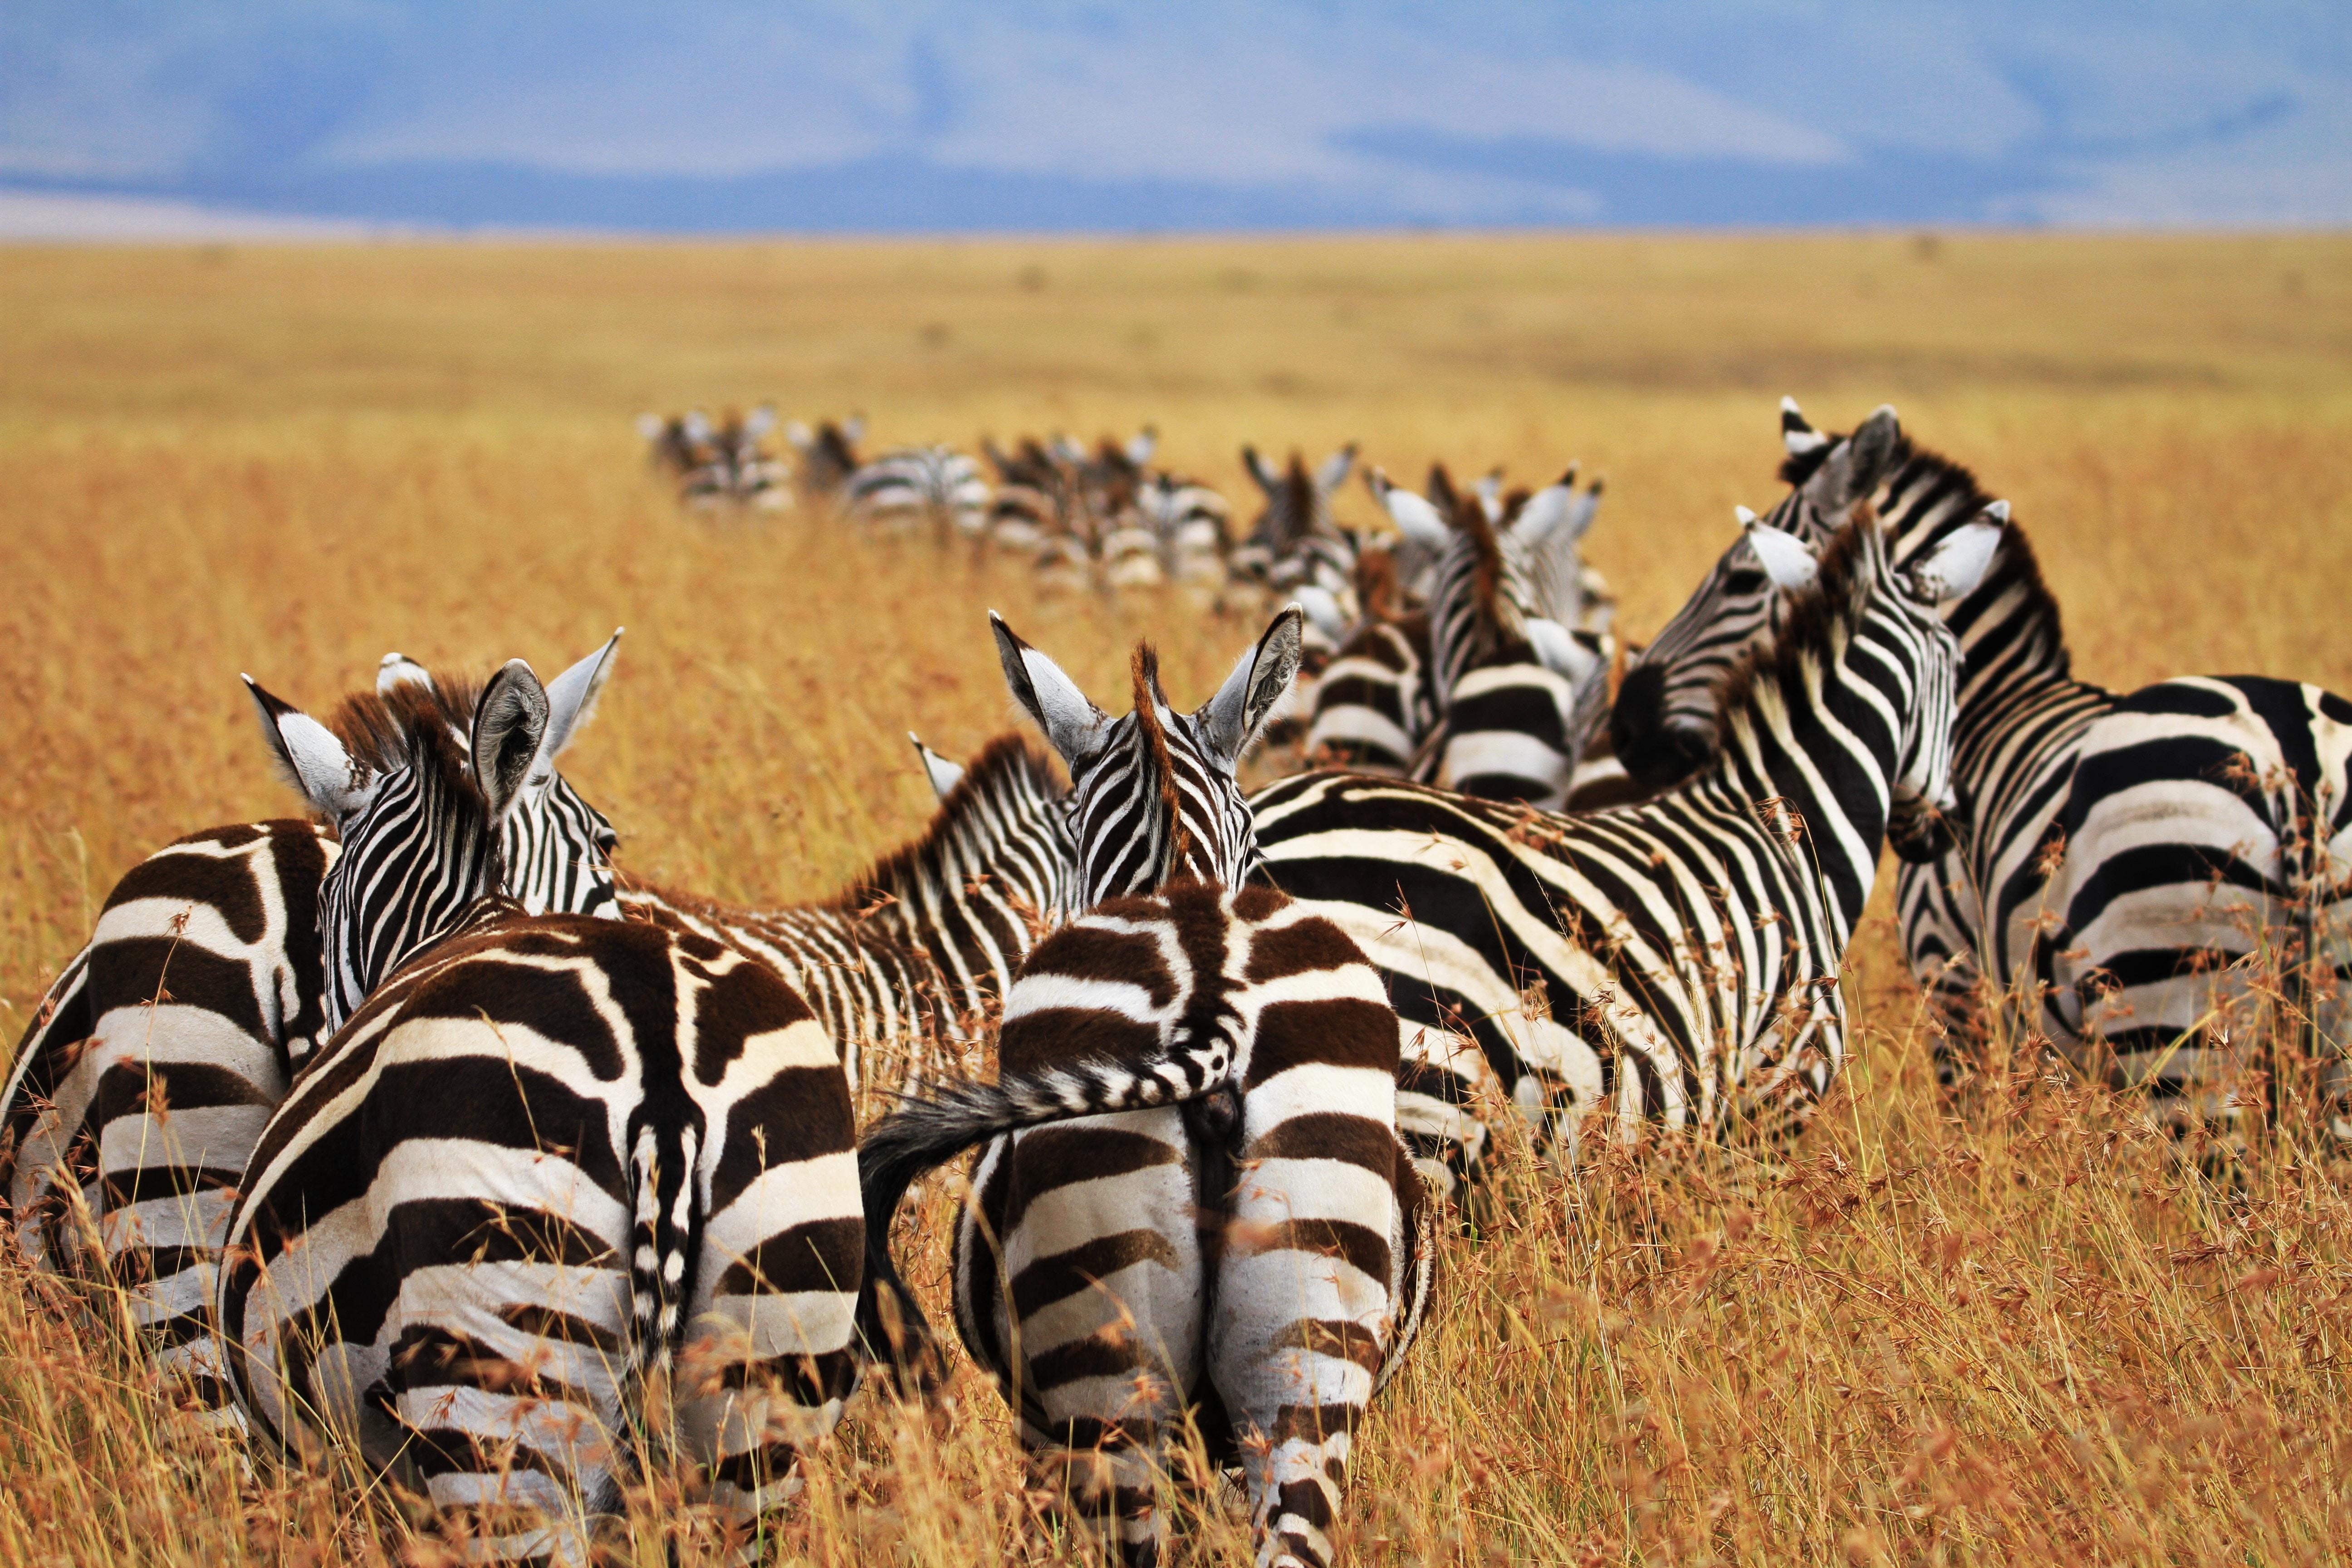 dazzle of zebras walking on desert during daytime